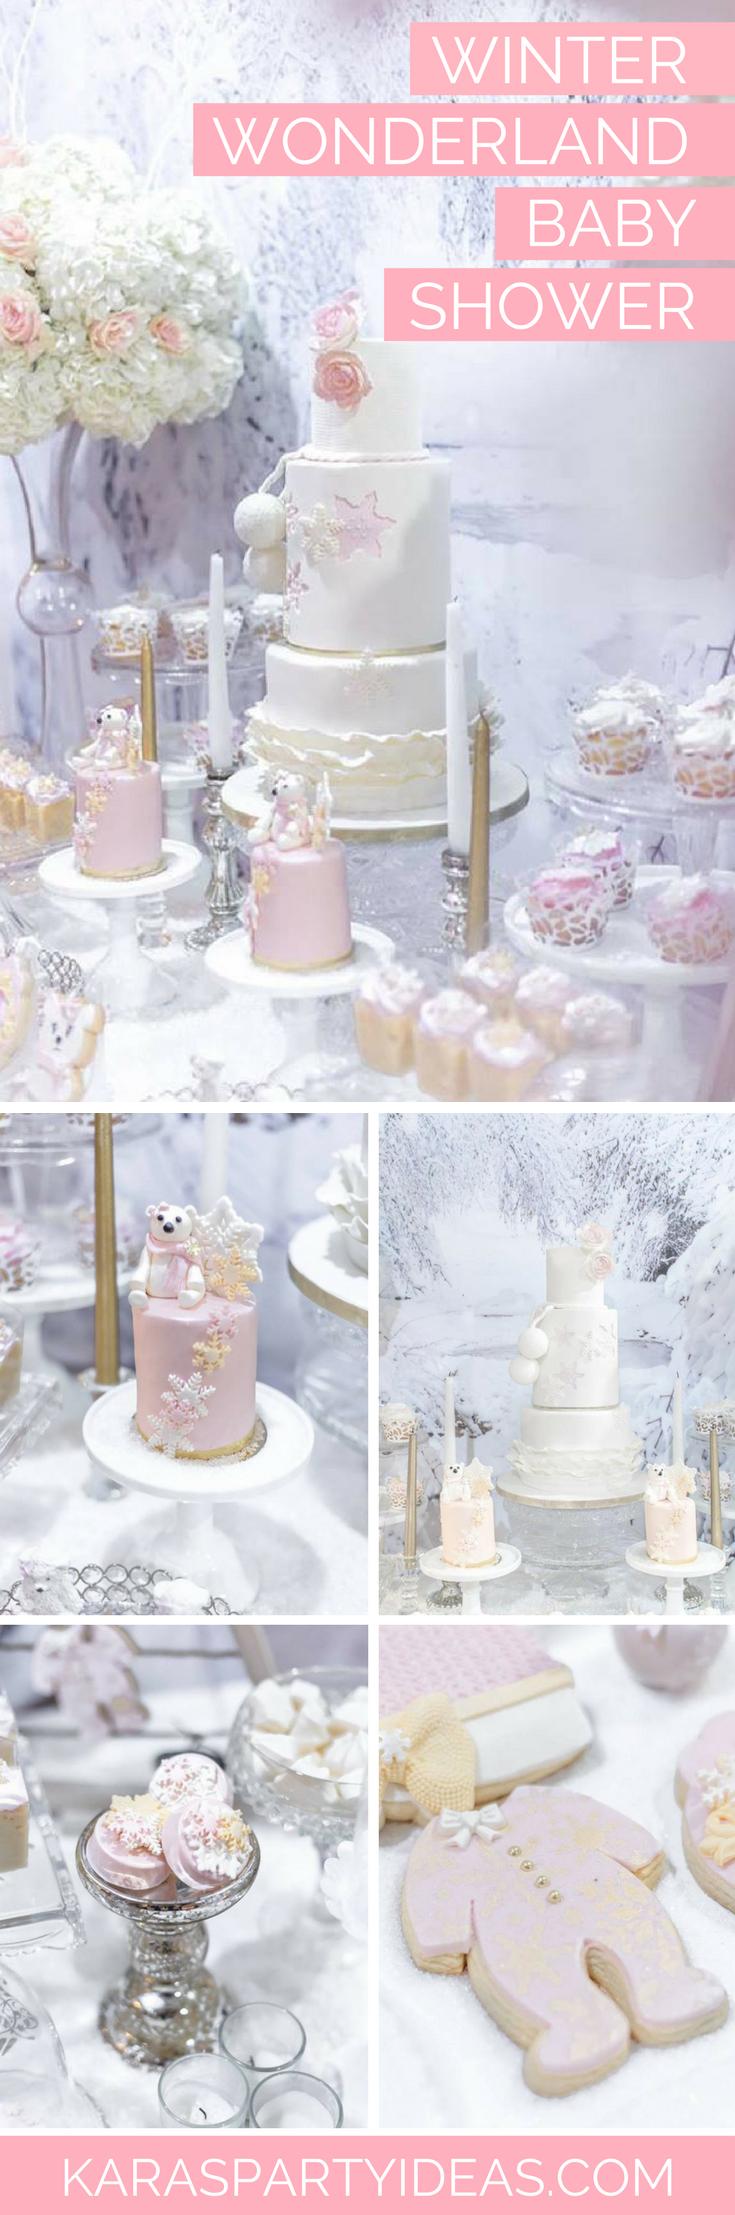 Winter Wonderland Baby Shower Via Karau0027s Party Ideas   KarasPartyIdeas.com